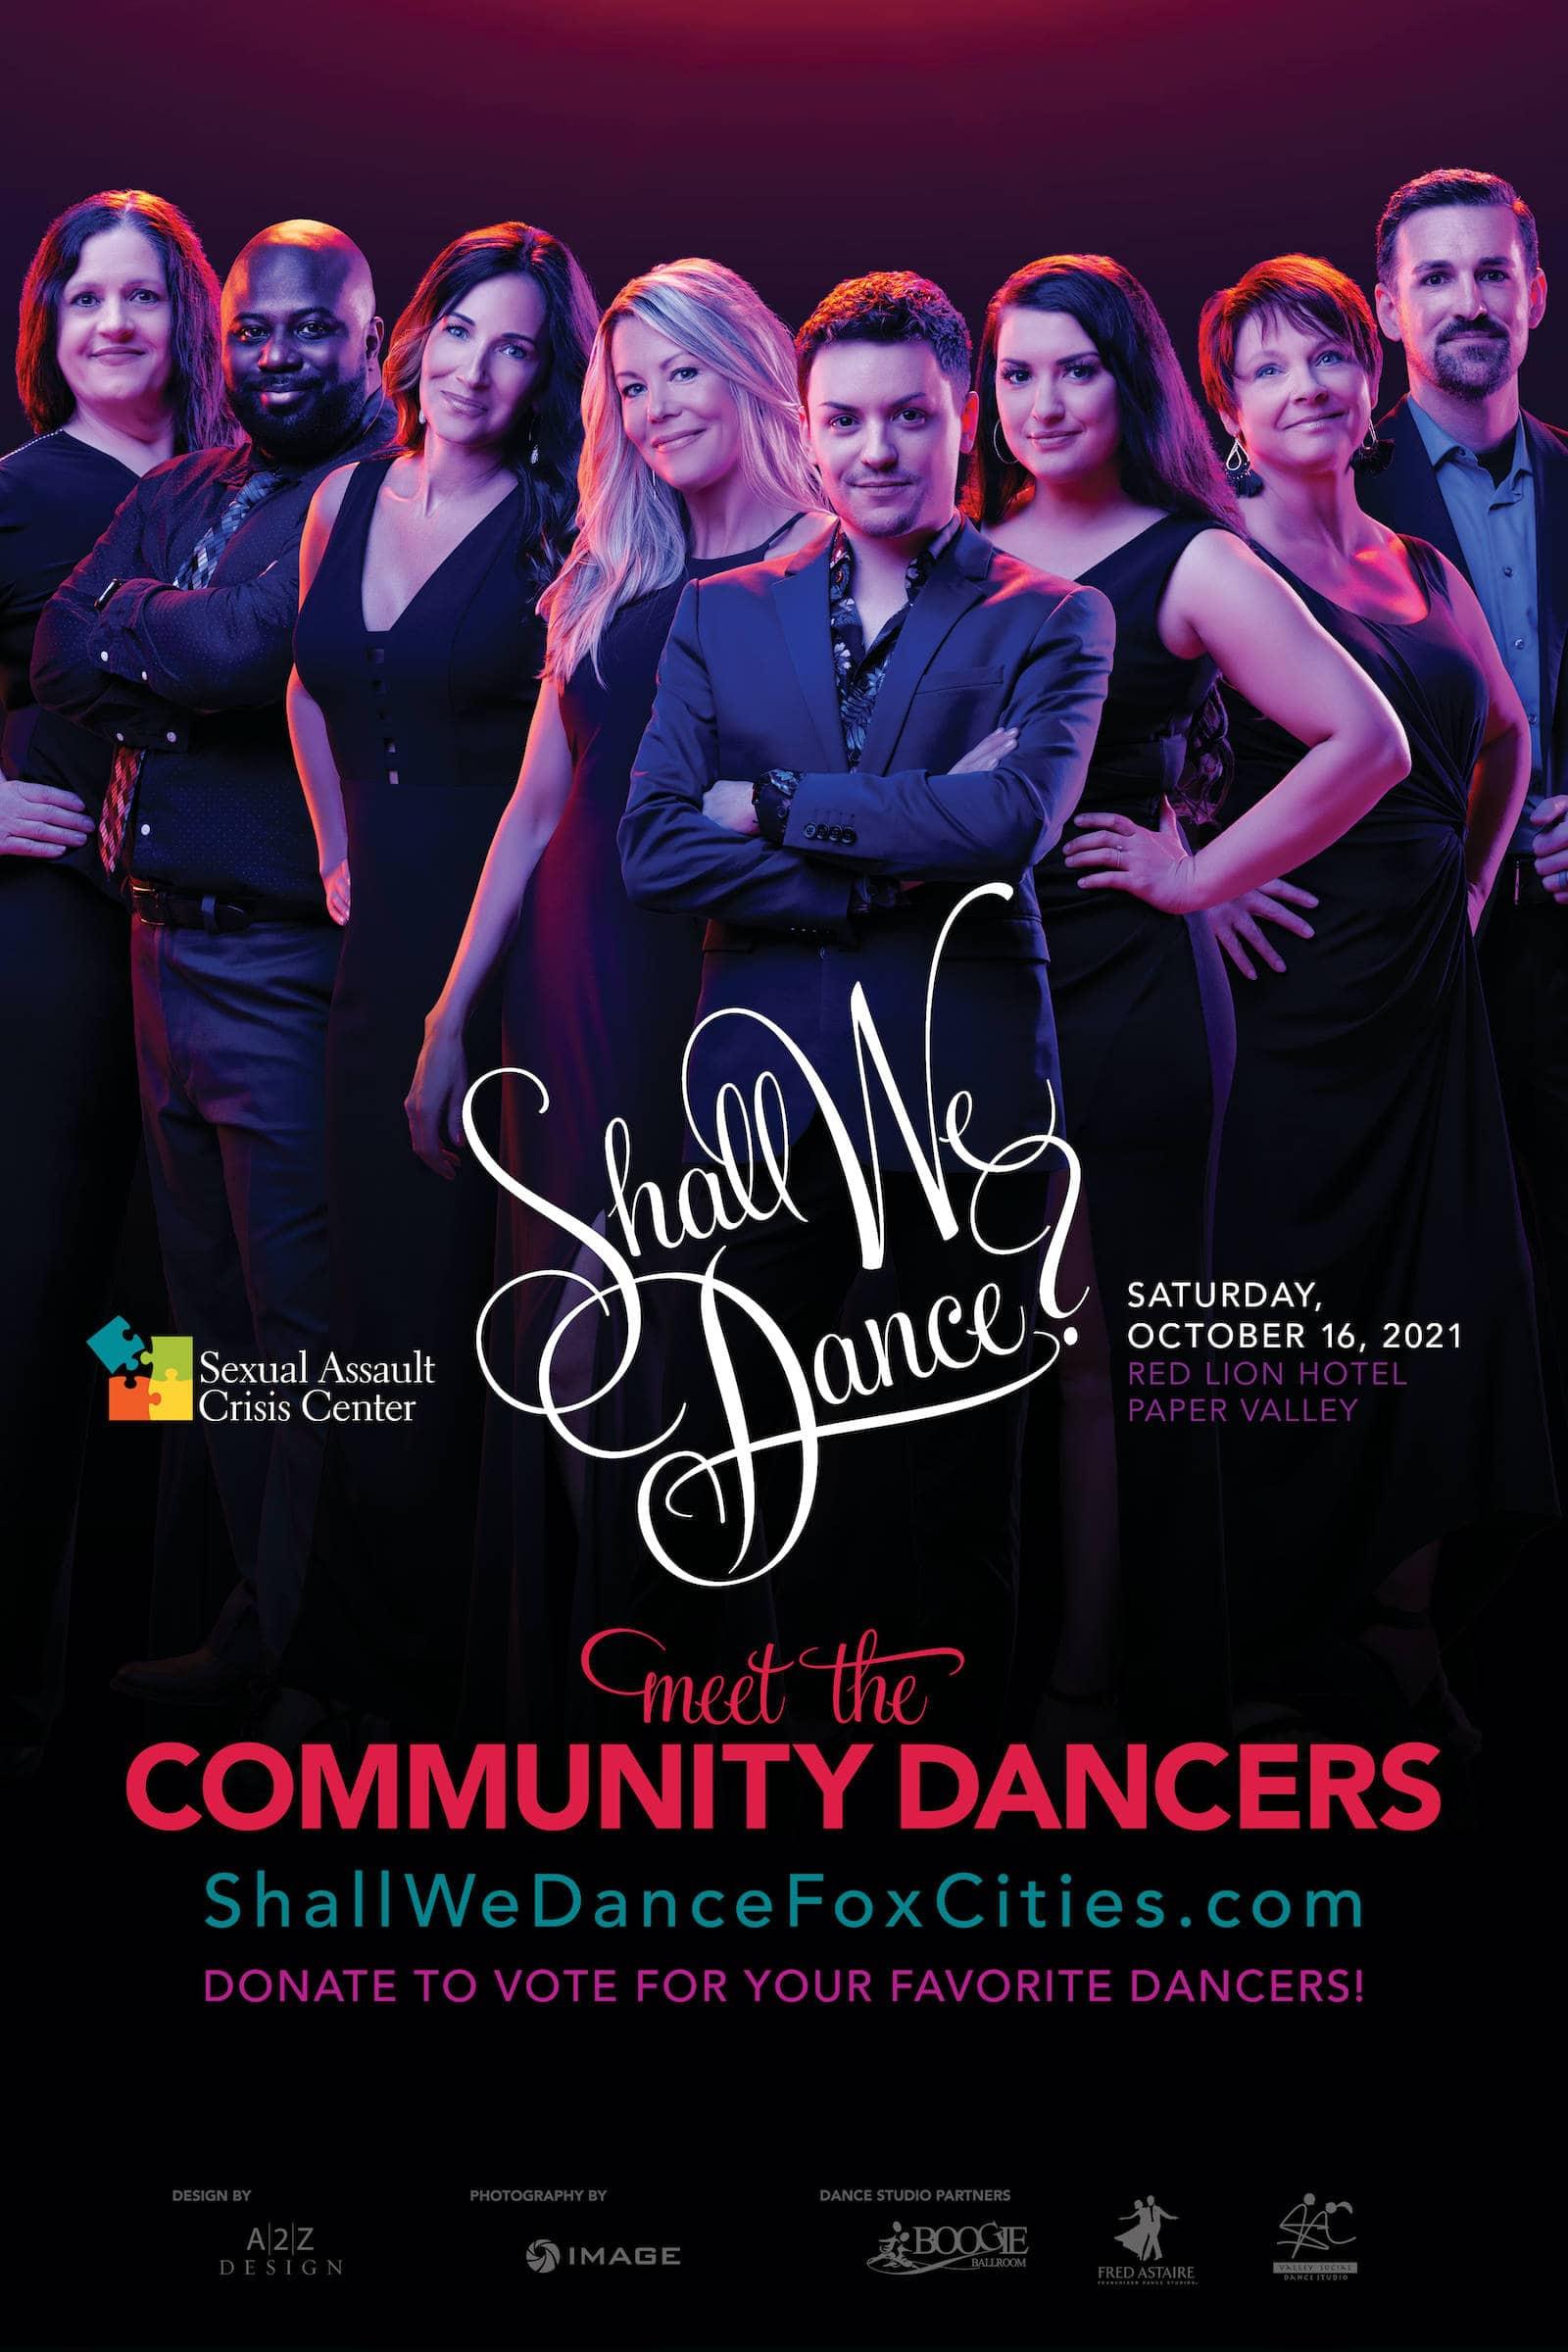 Meet the Community Dancers